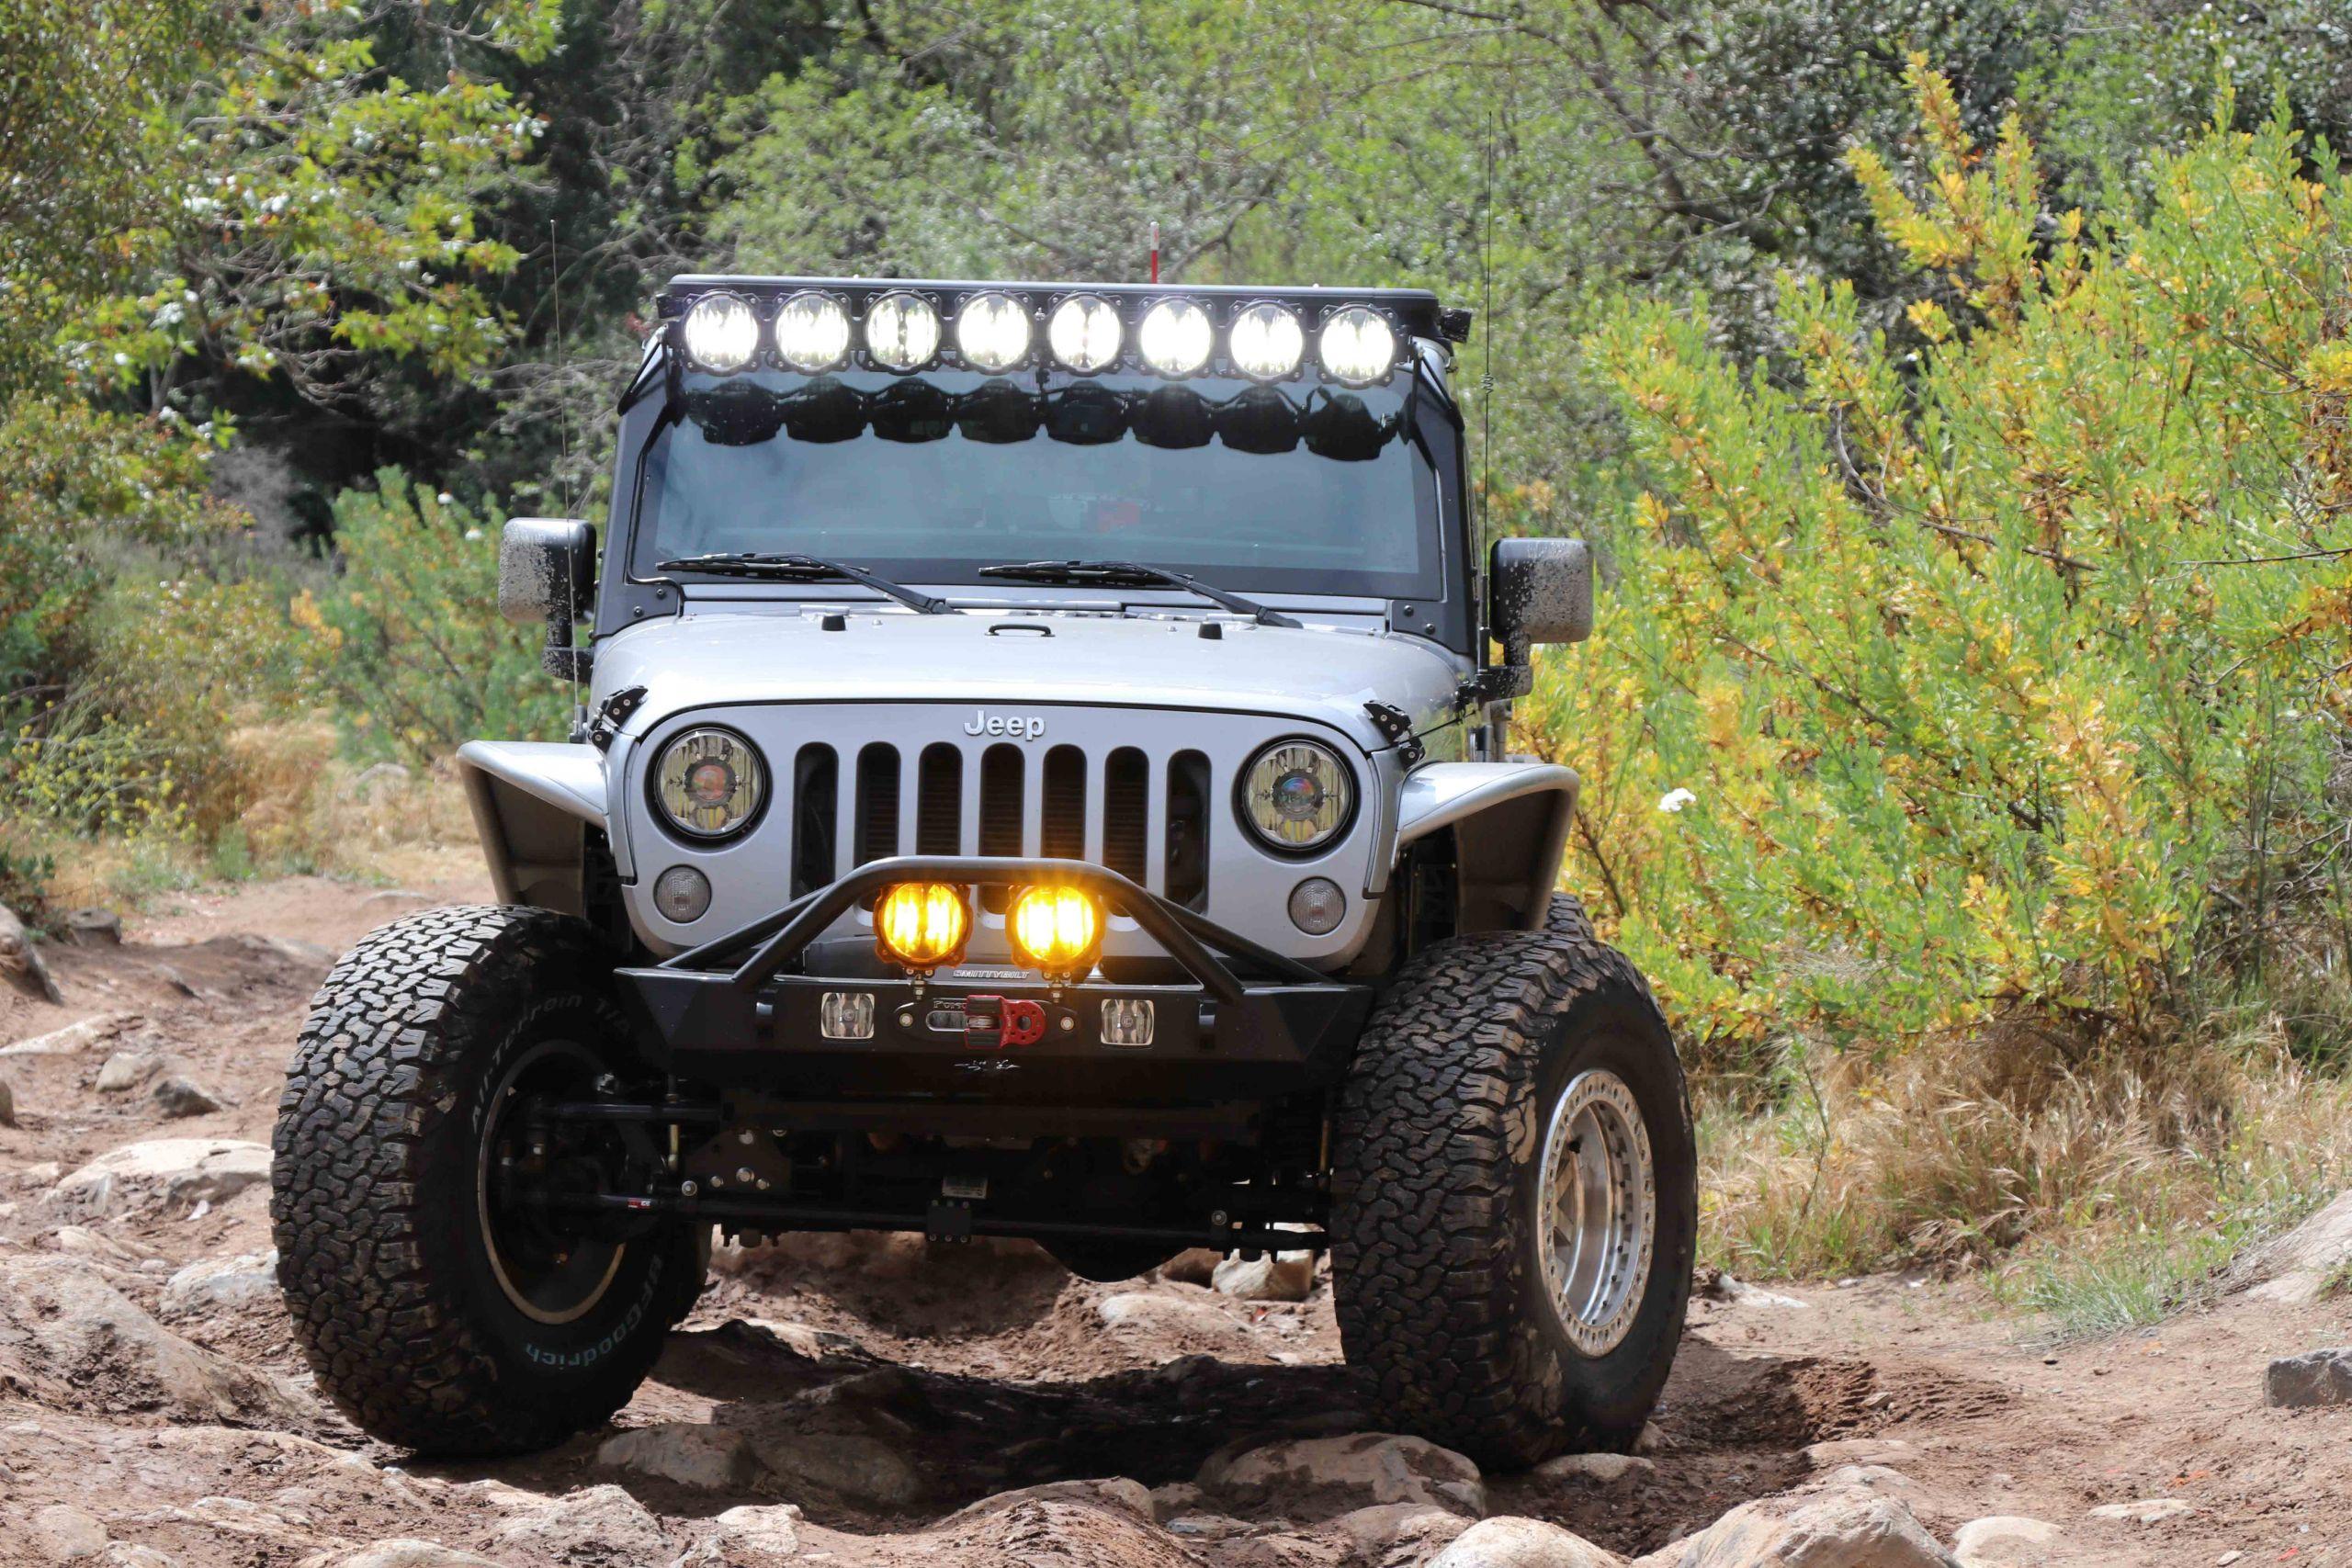 TrailRecon's Custom Jeep JK Overlanding Rig / Build - Image #05